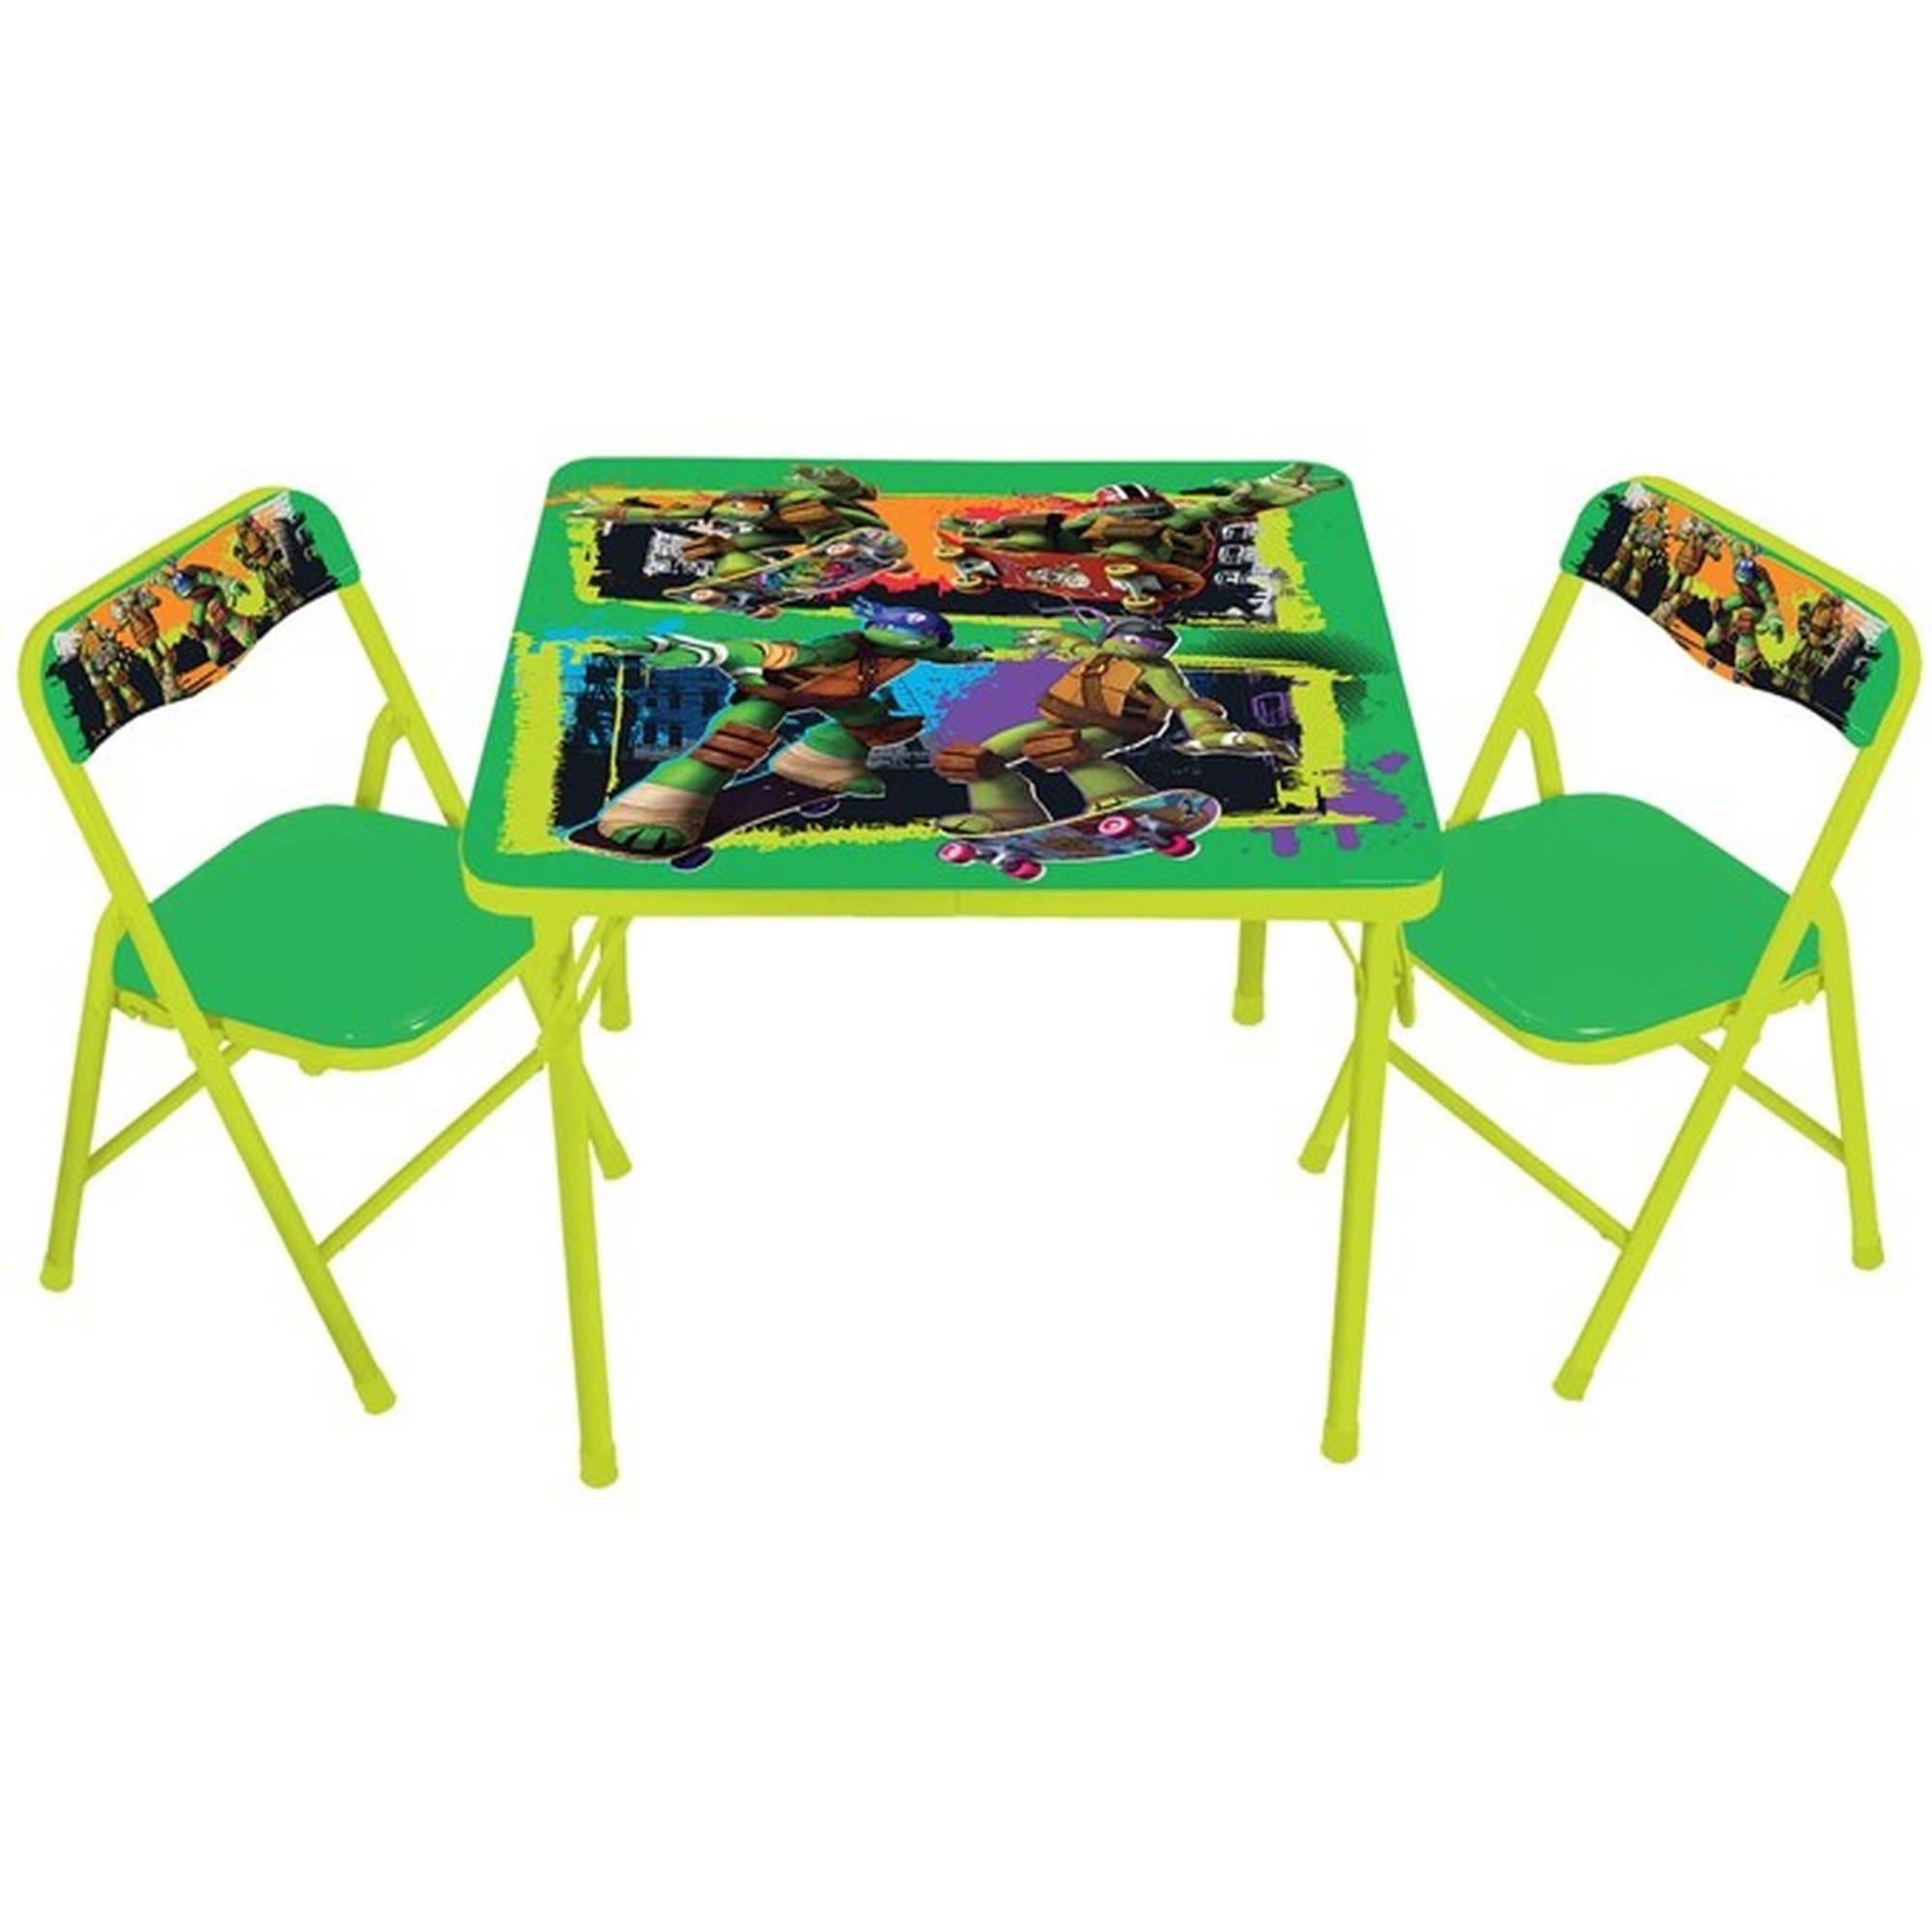 Teenage Mutant Ninja Turtles Maxin & Shellaxin Erasable Activity Table Set and 2 chairs by Teenage Mutant Ninja Turtles